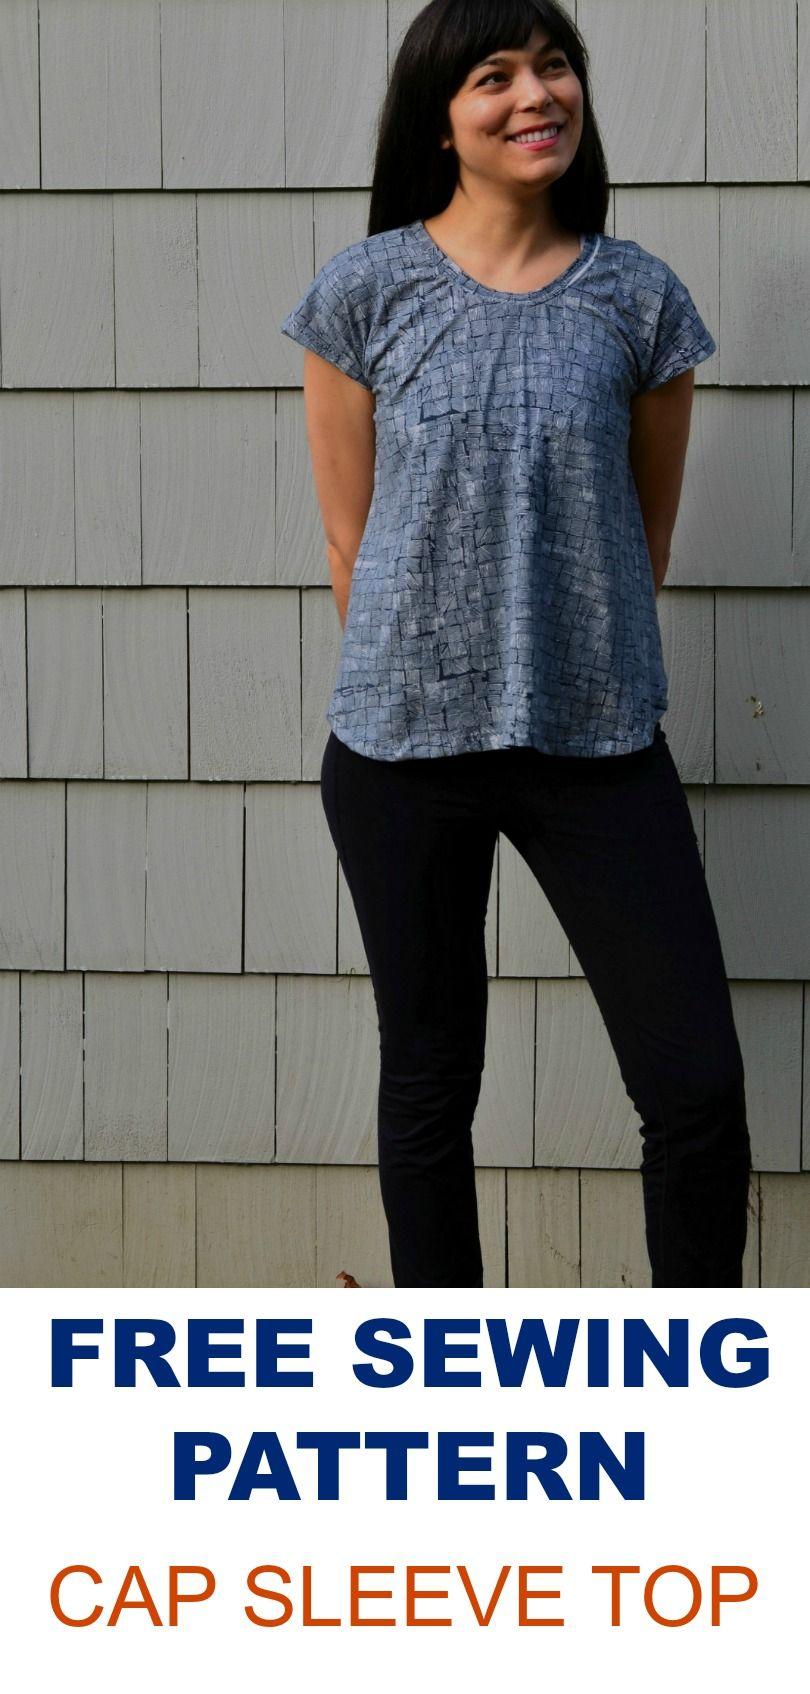 Free Sewing Pattern : CAP SLEEVE TOP | Schnittmuster kostenlos ...